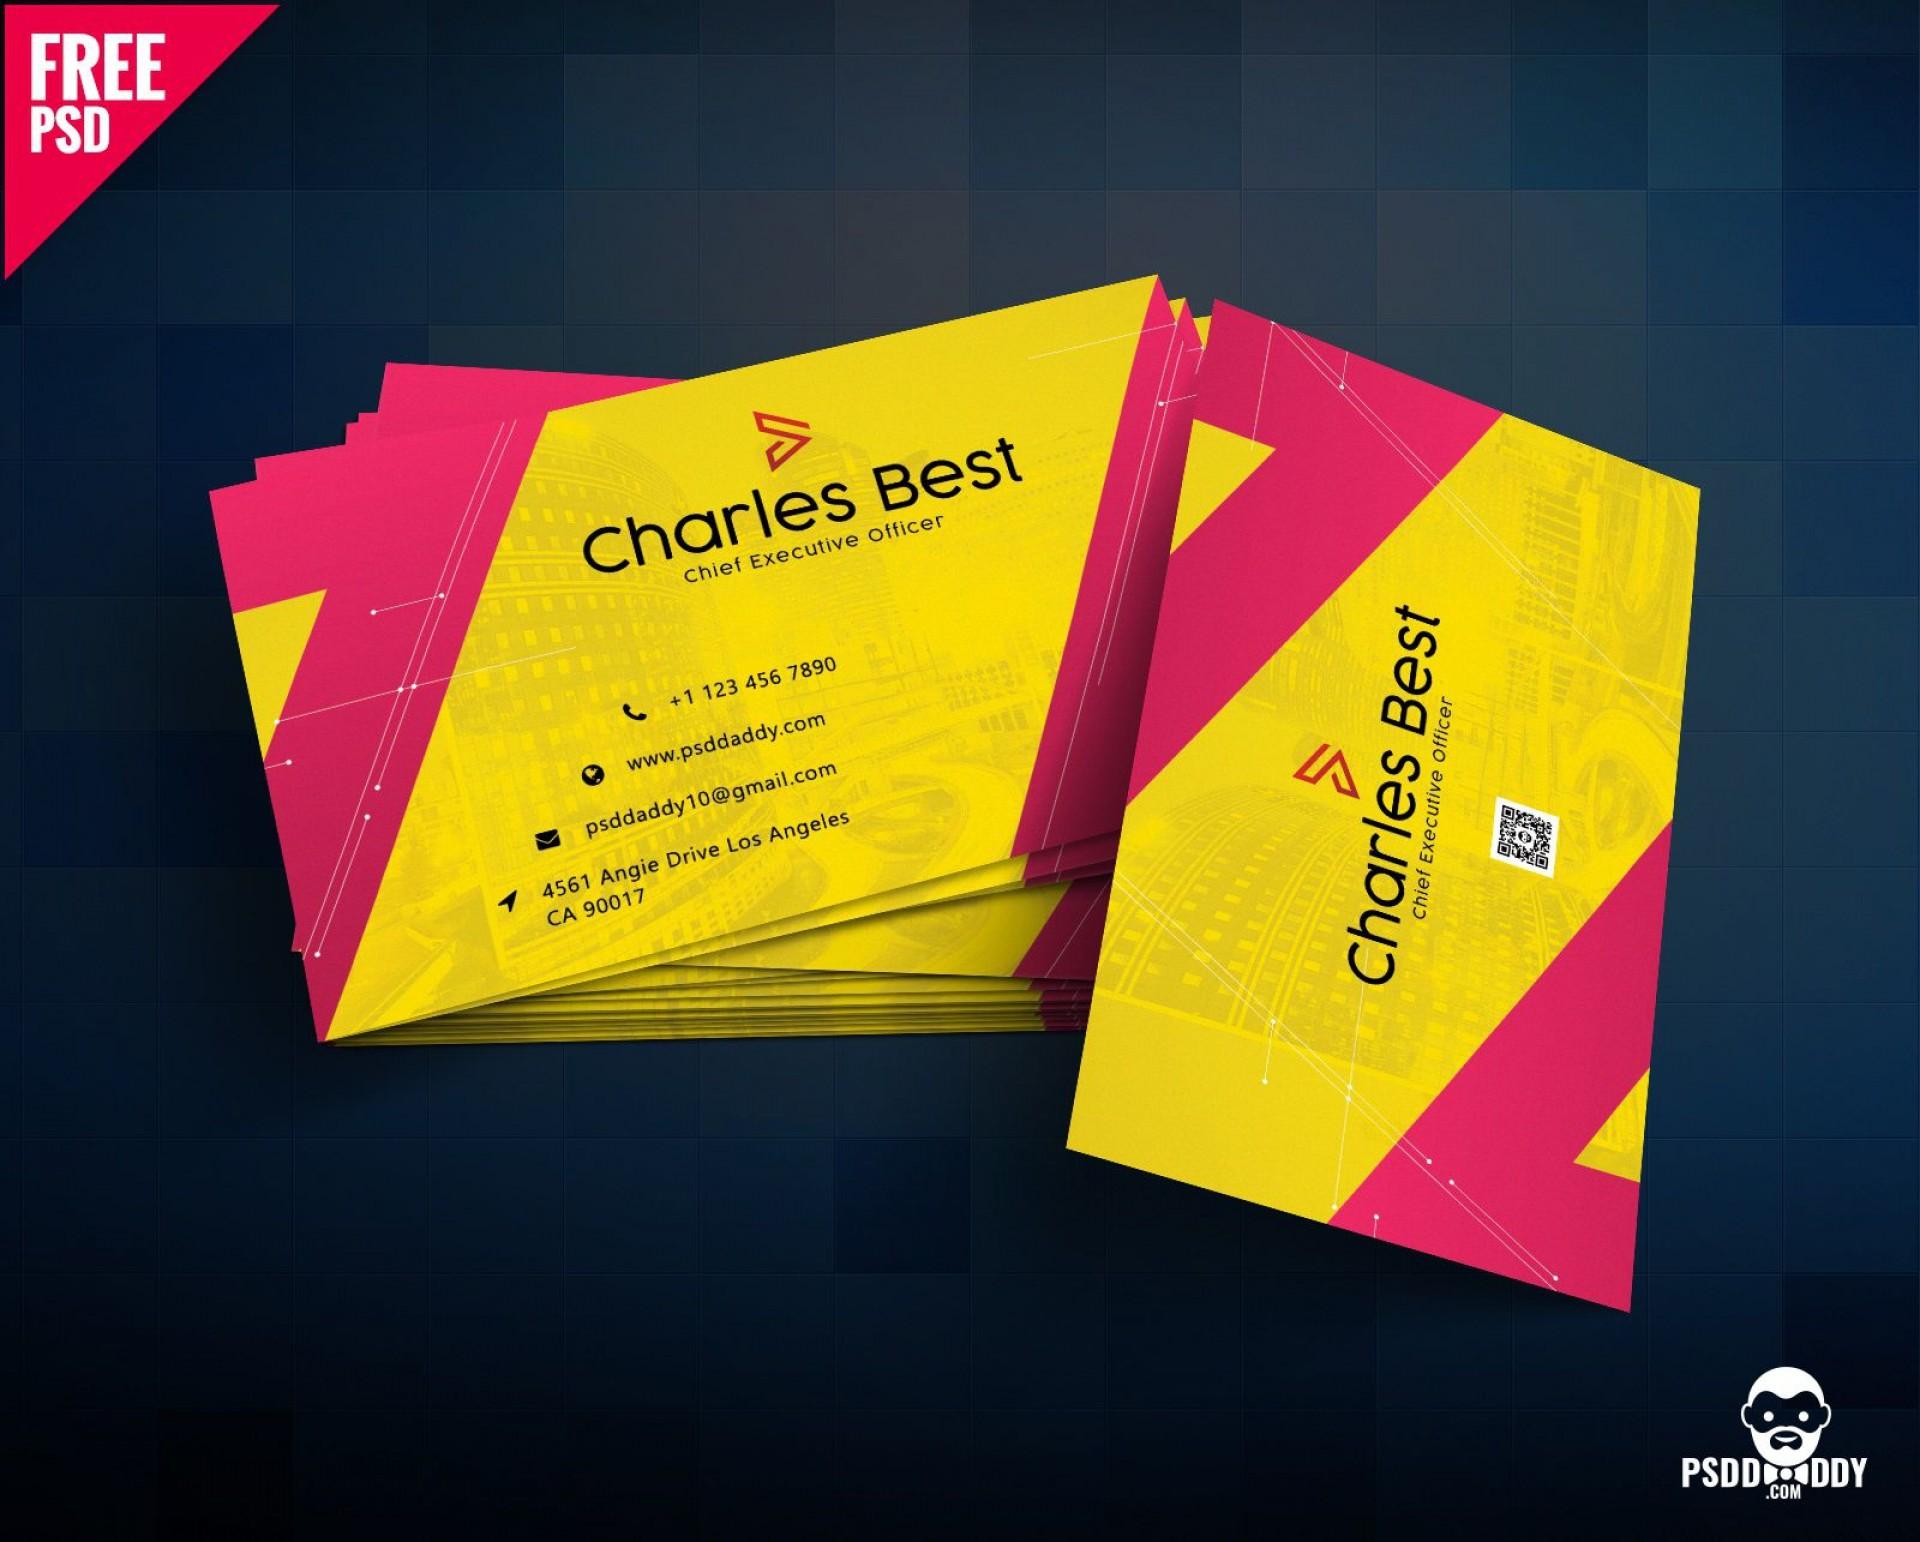 004 Excellent Busines Card Template Free Download Idea  Psd File Pdf Ppt1920